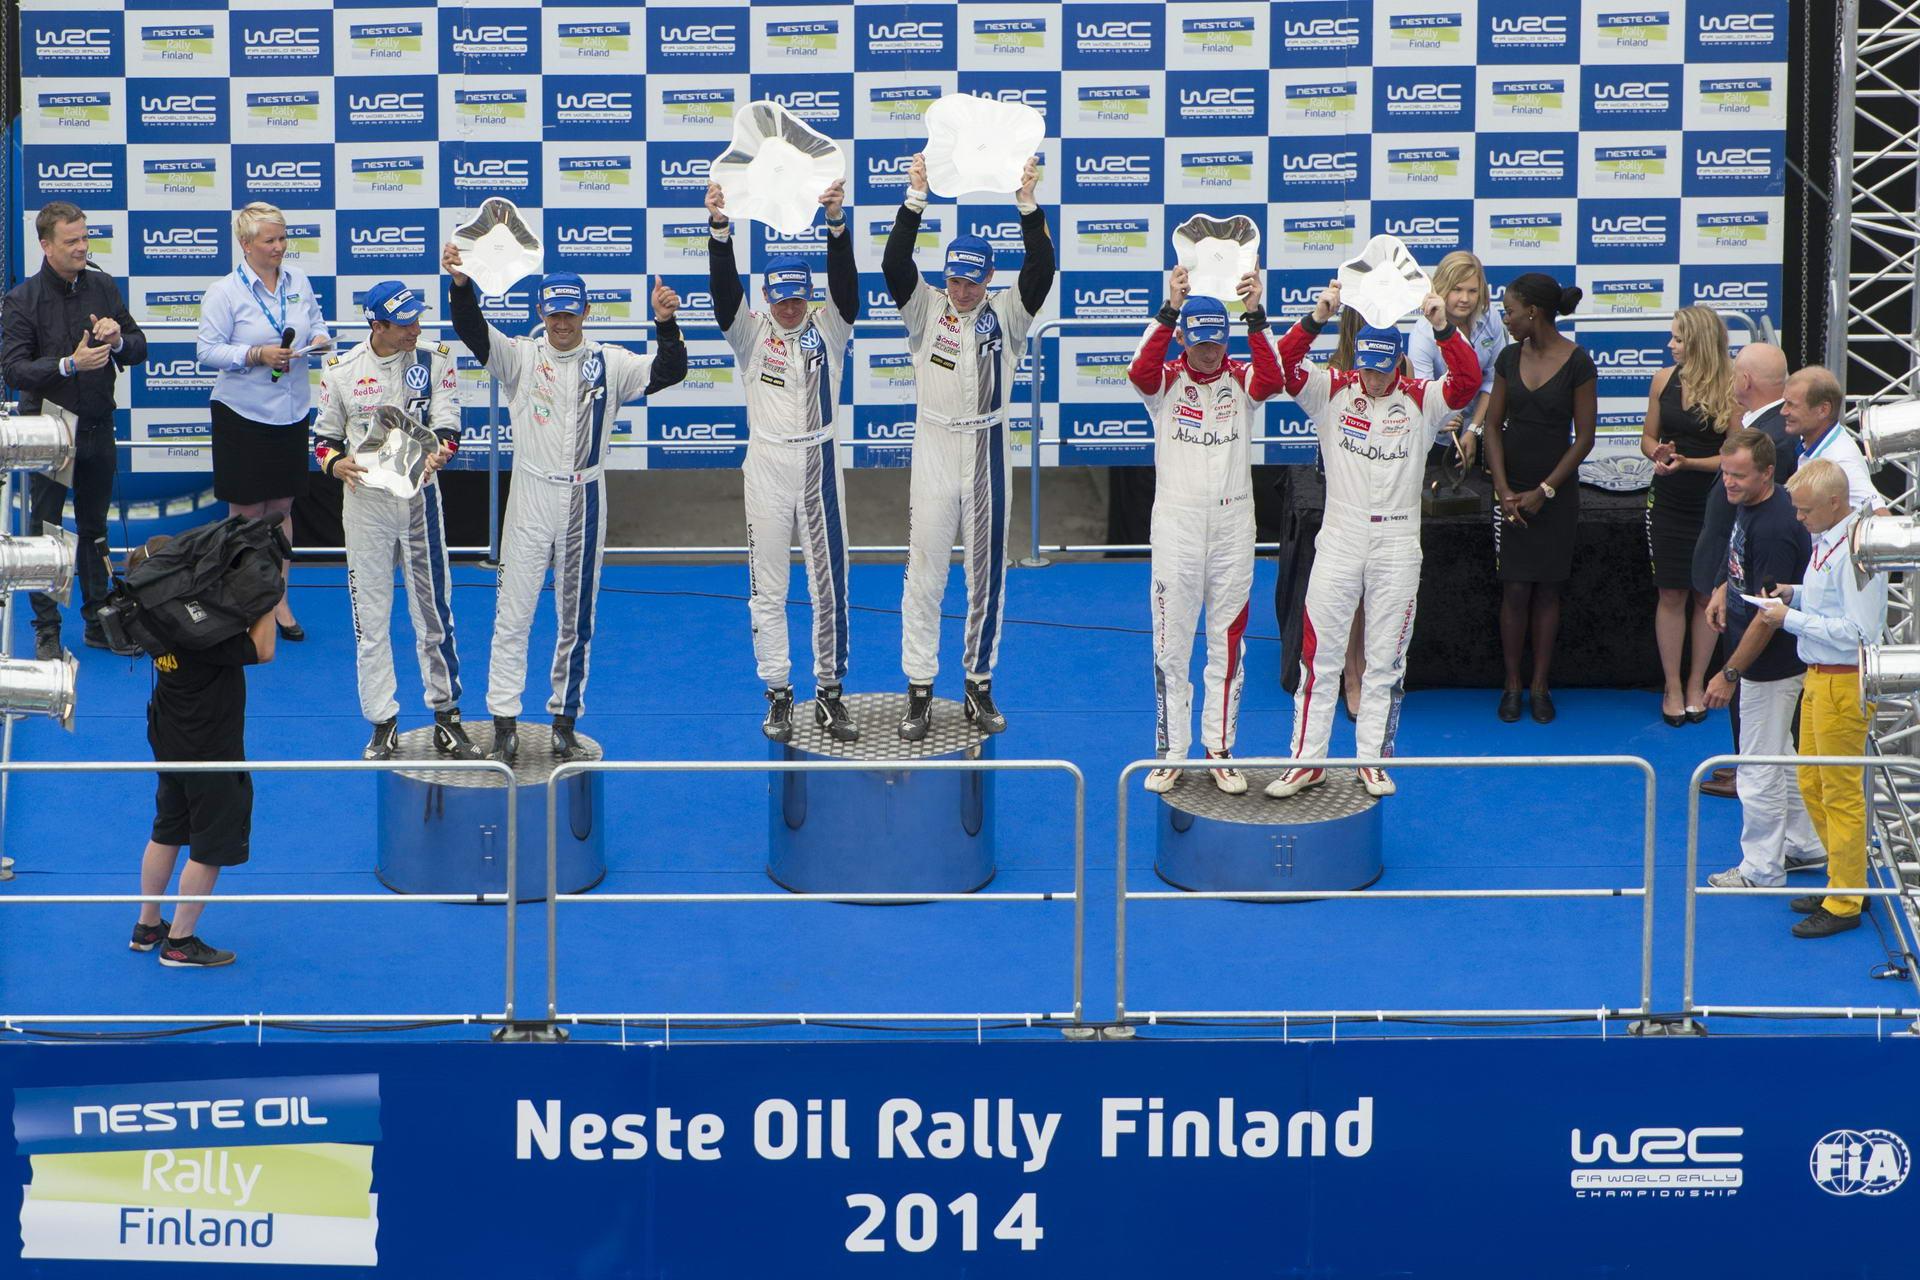 WRC Closest 1-2 - Finland 2014